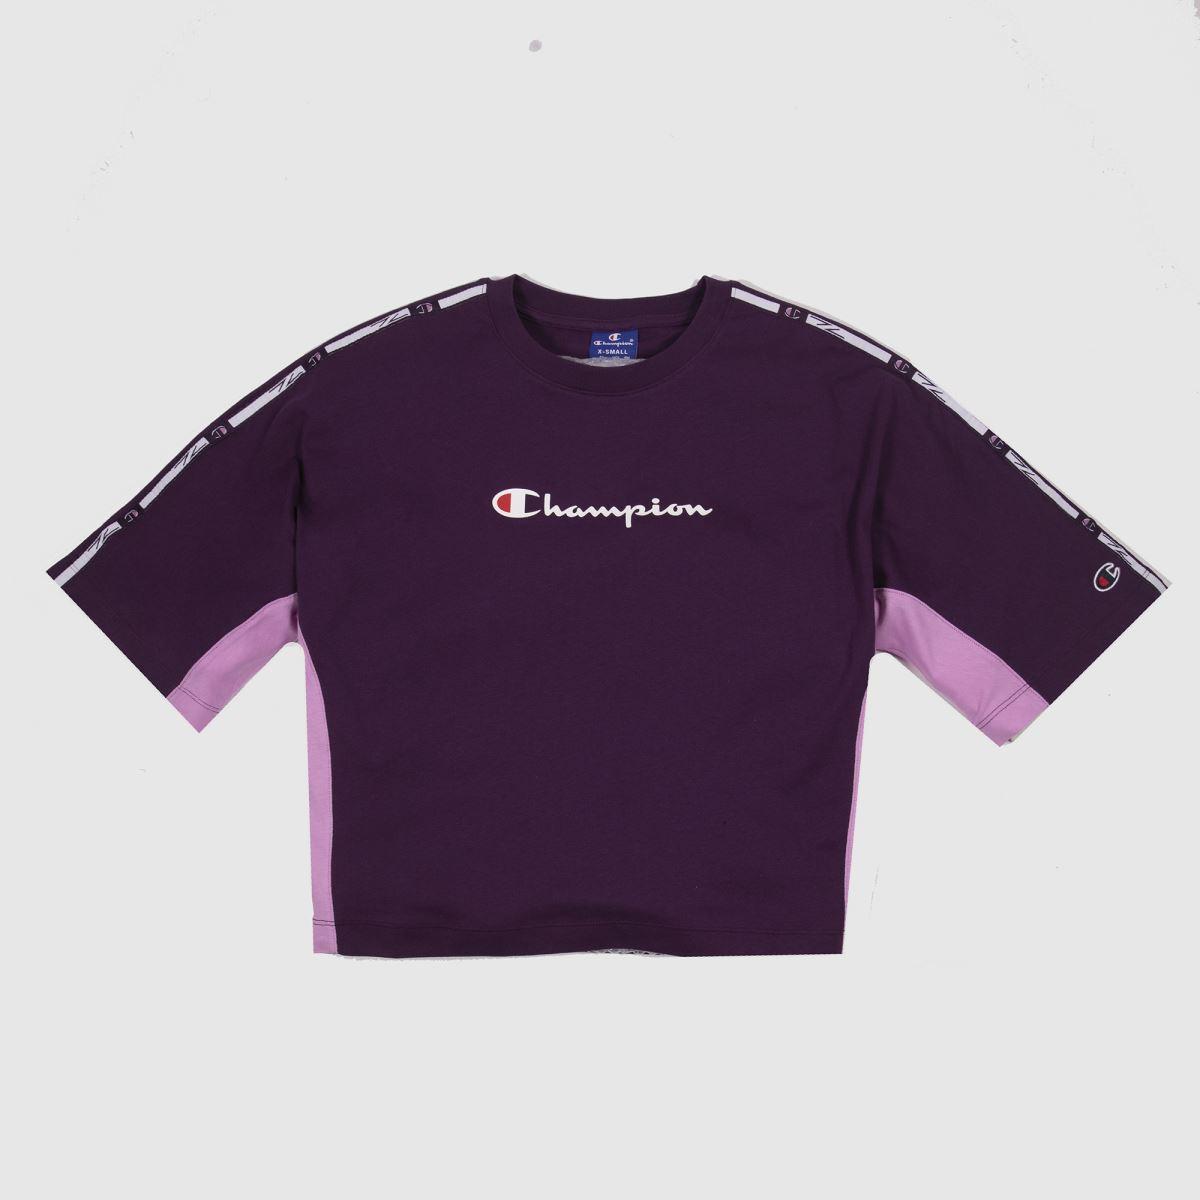 Champion Purple Crewneck T-shirt